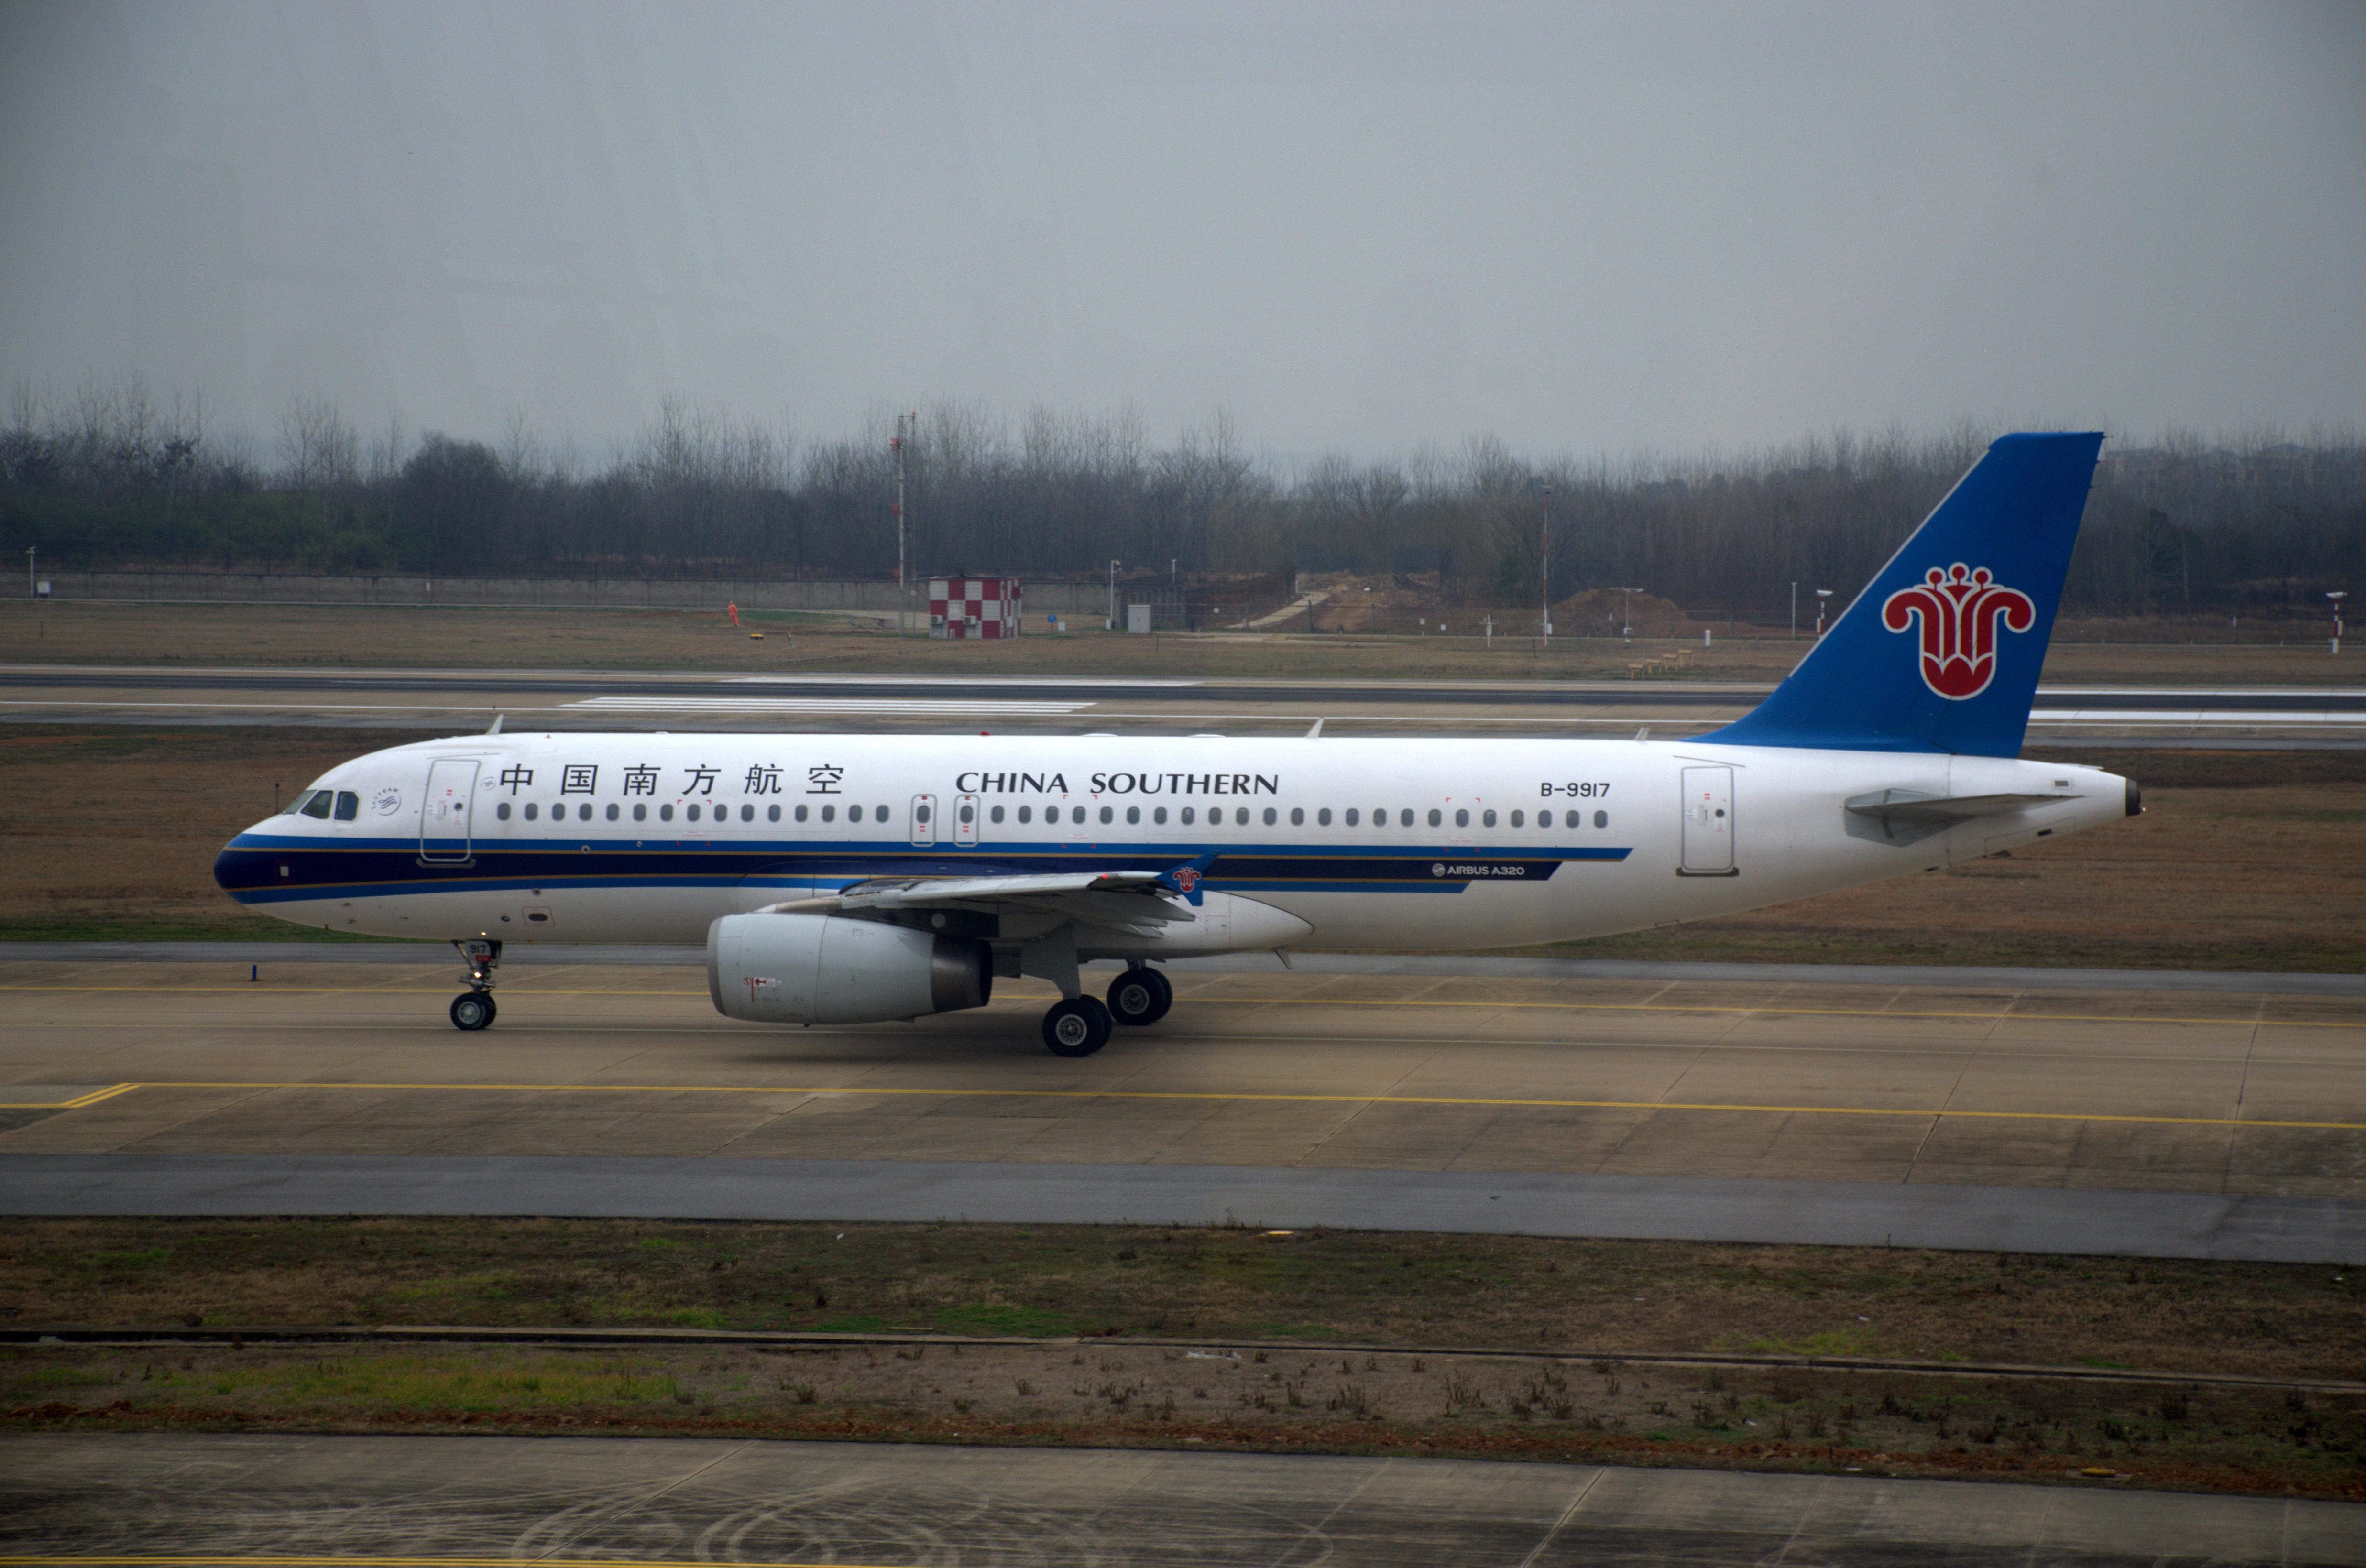 Самолет Airbus A320 авиакомпании China Southern Airlines в аэропорту Ухань (Китай)